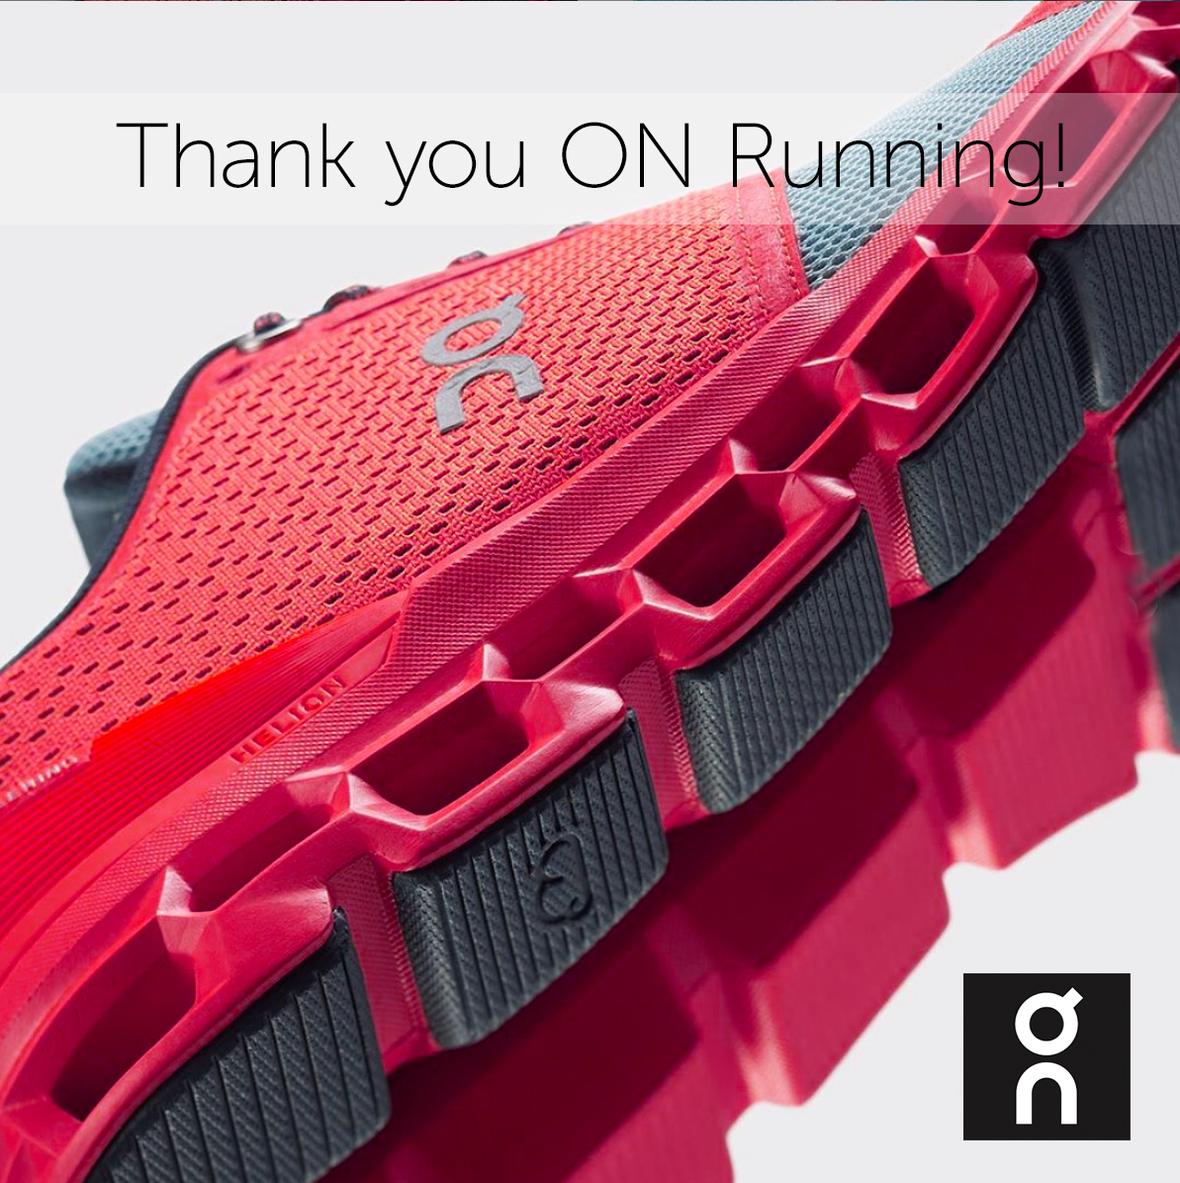 thanks ON running